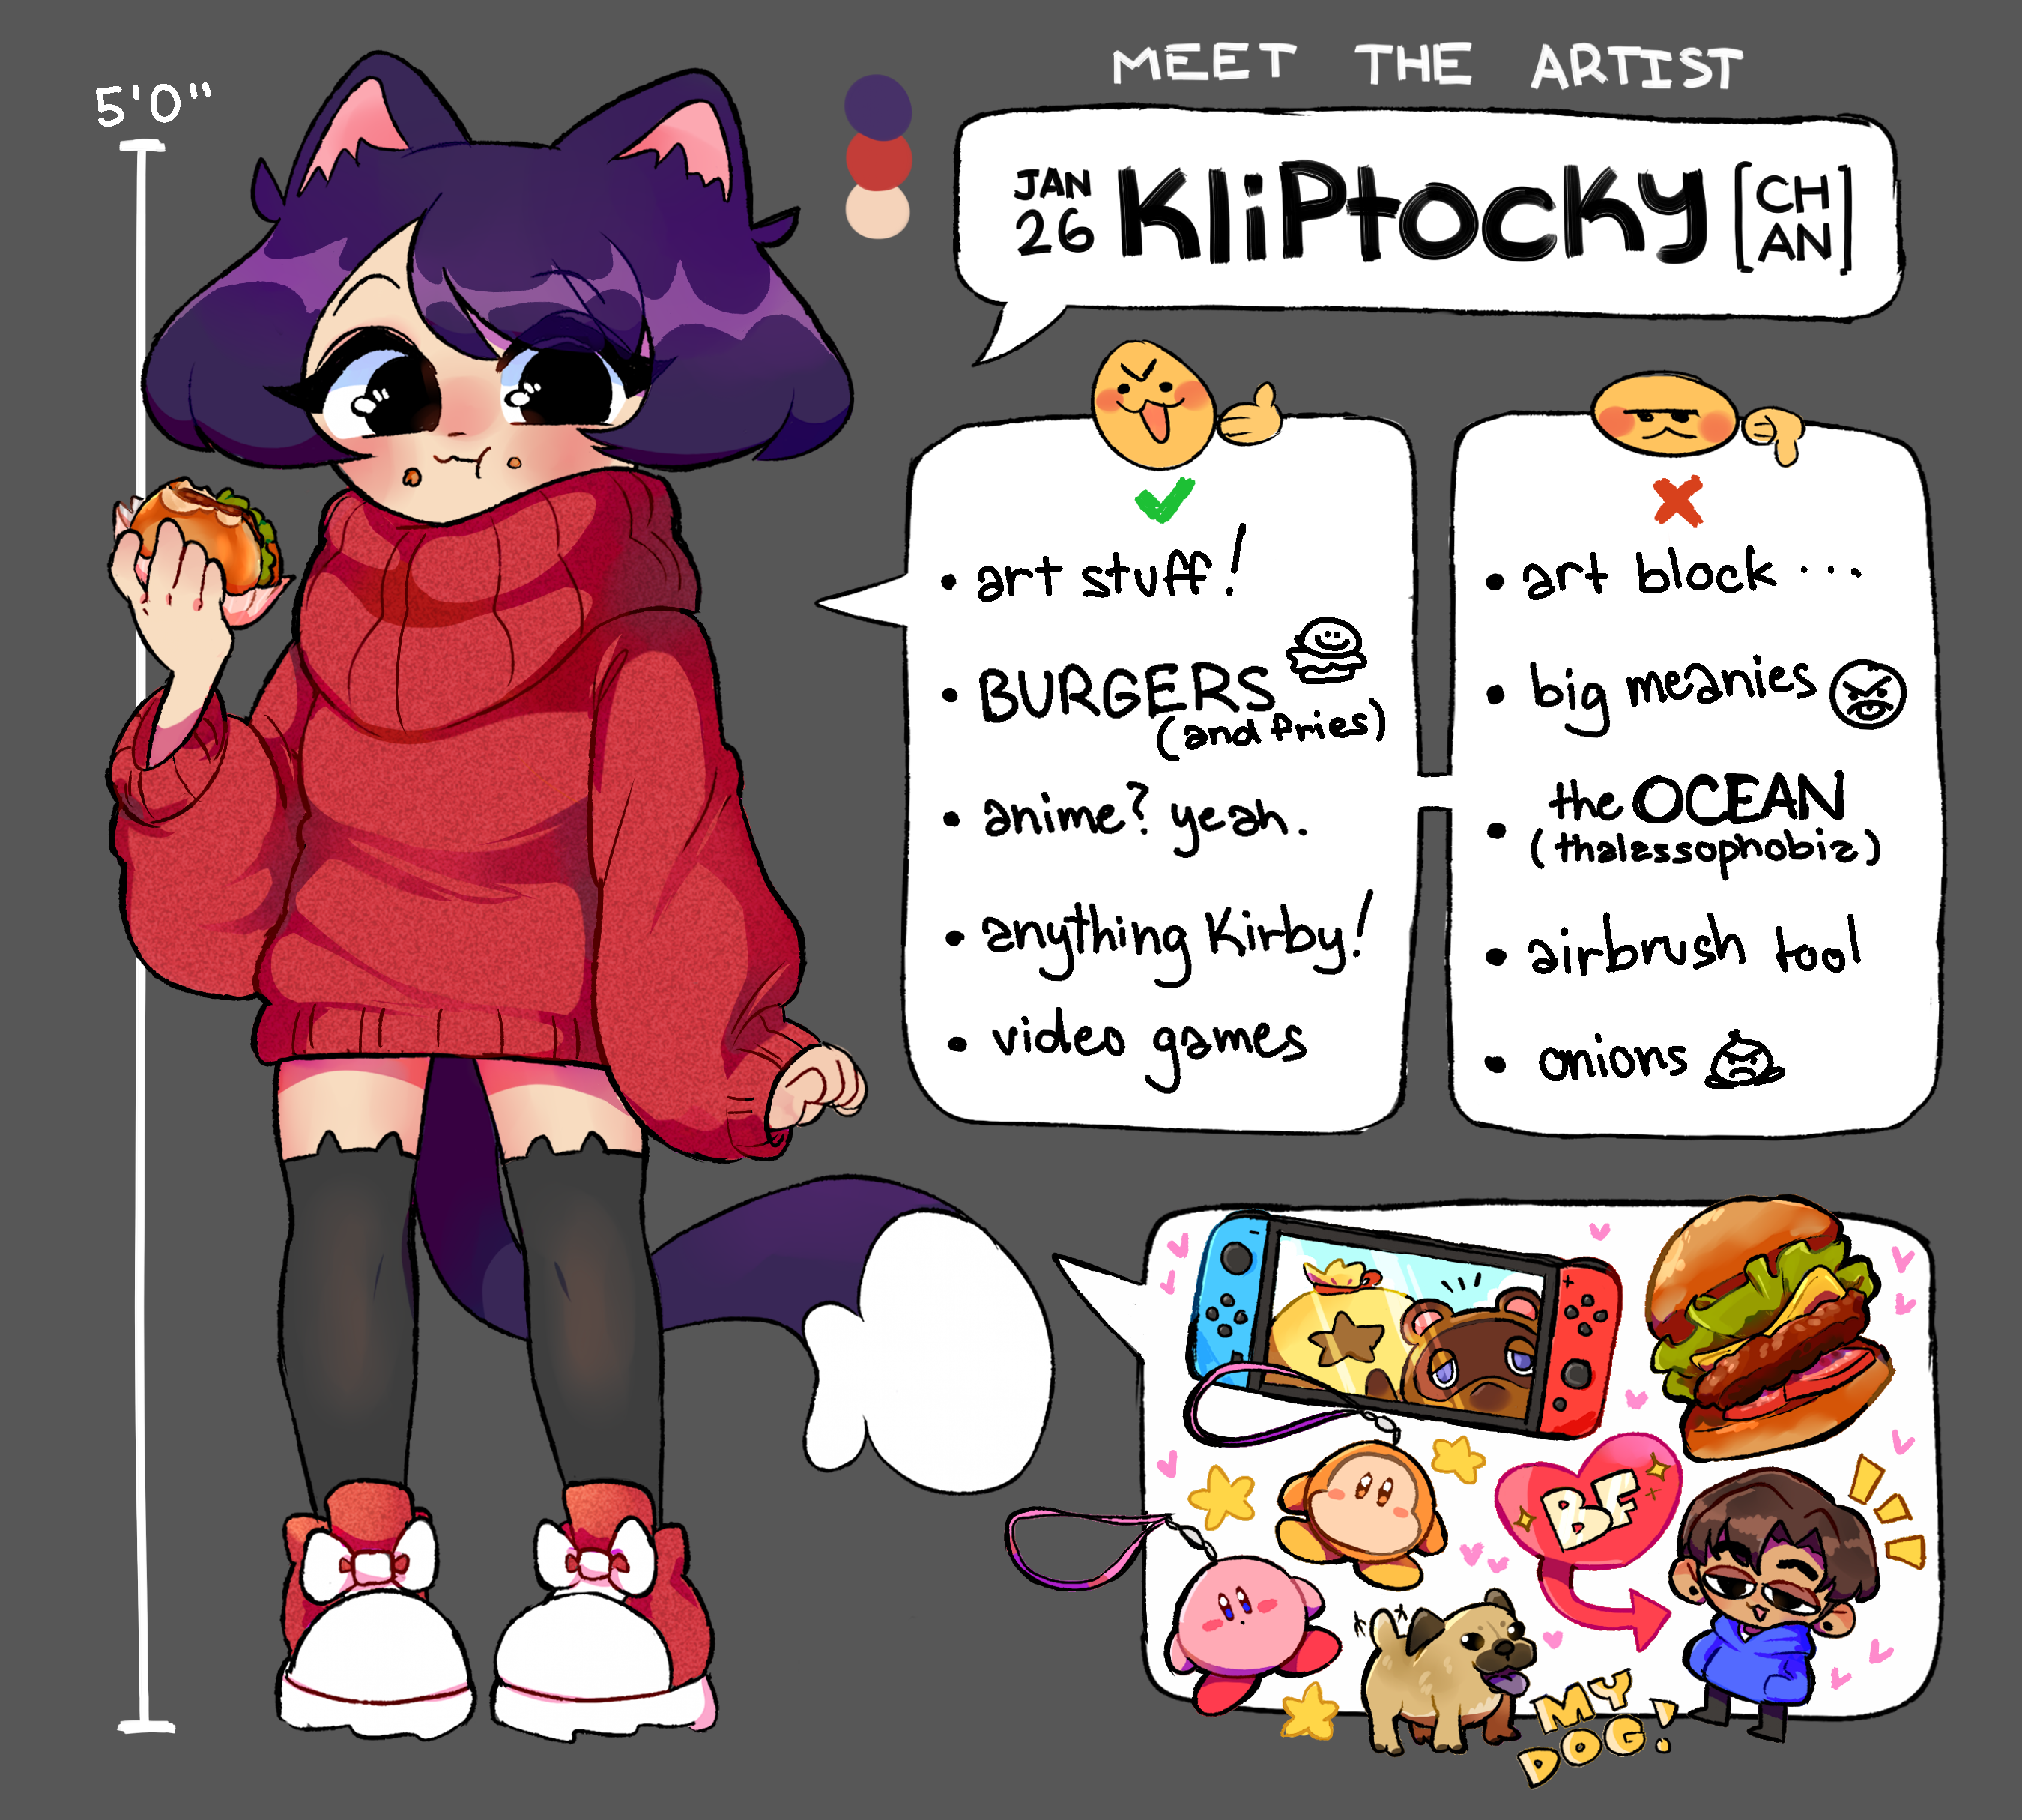 meet the artist - kliptocky